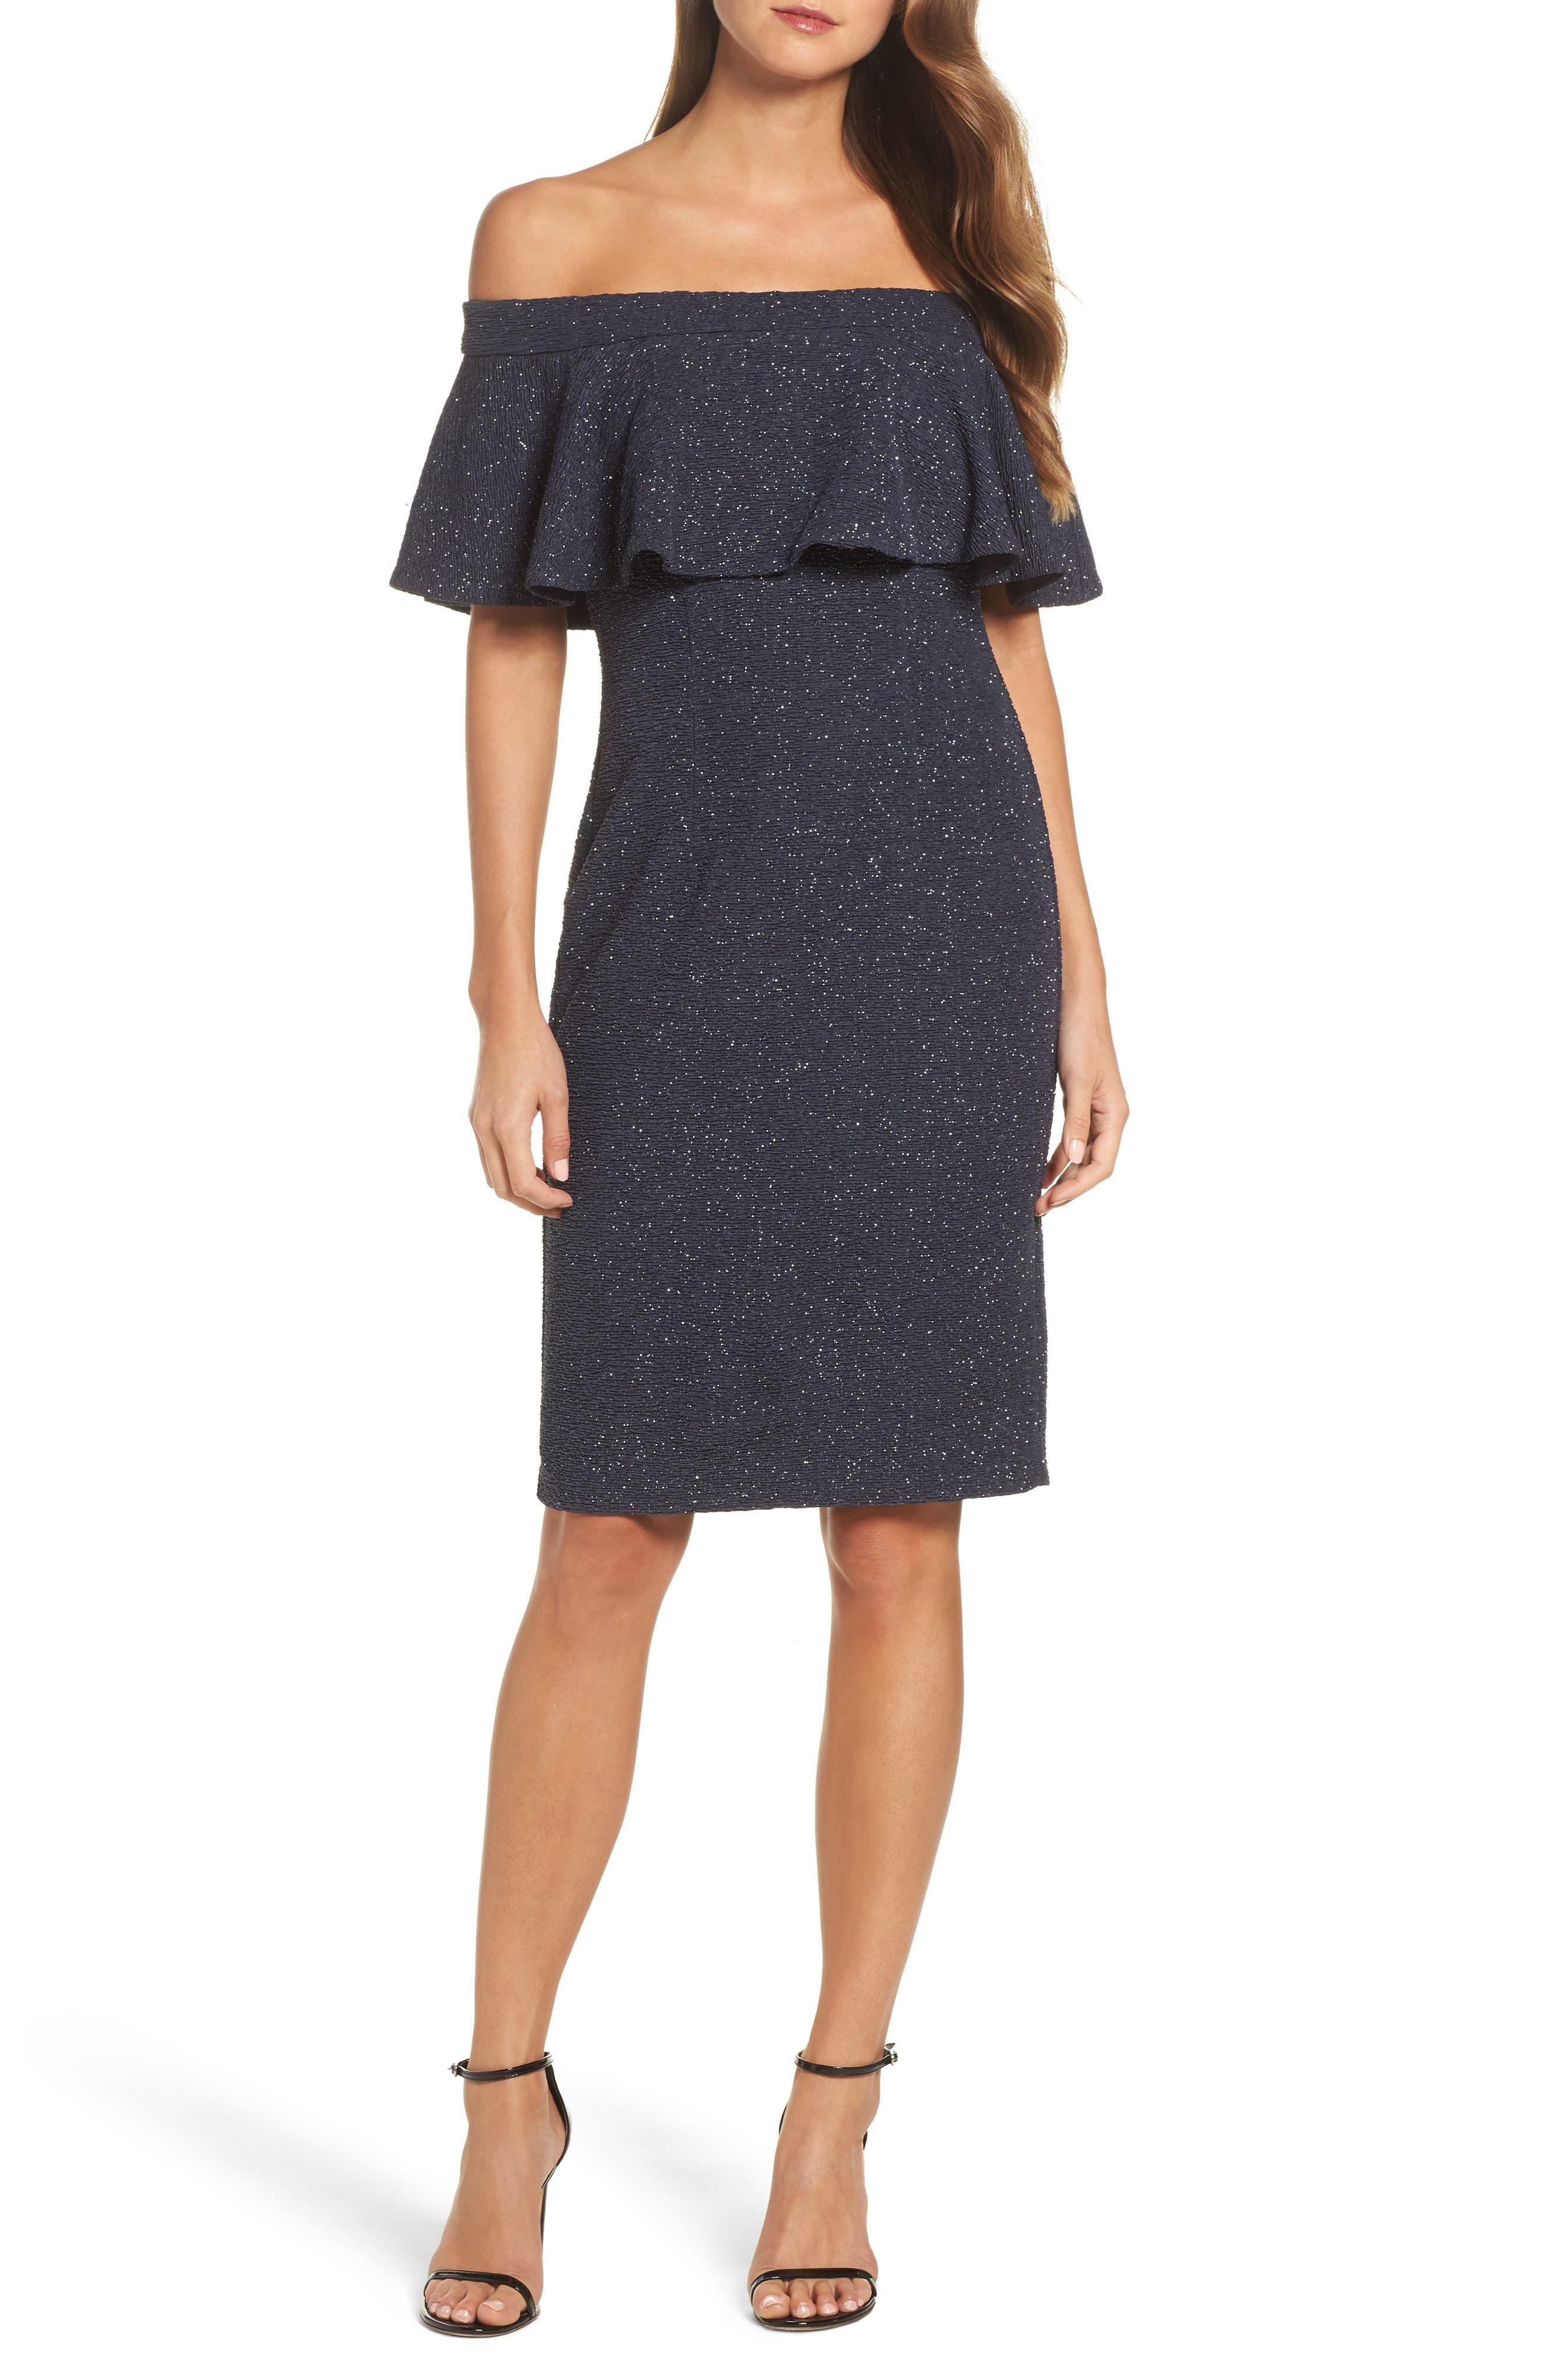 Alternate Image 1 Selected - Eliza J Glitter Knit Ruffle Off the Shoulder Dress